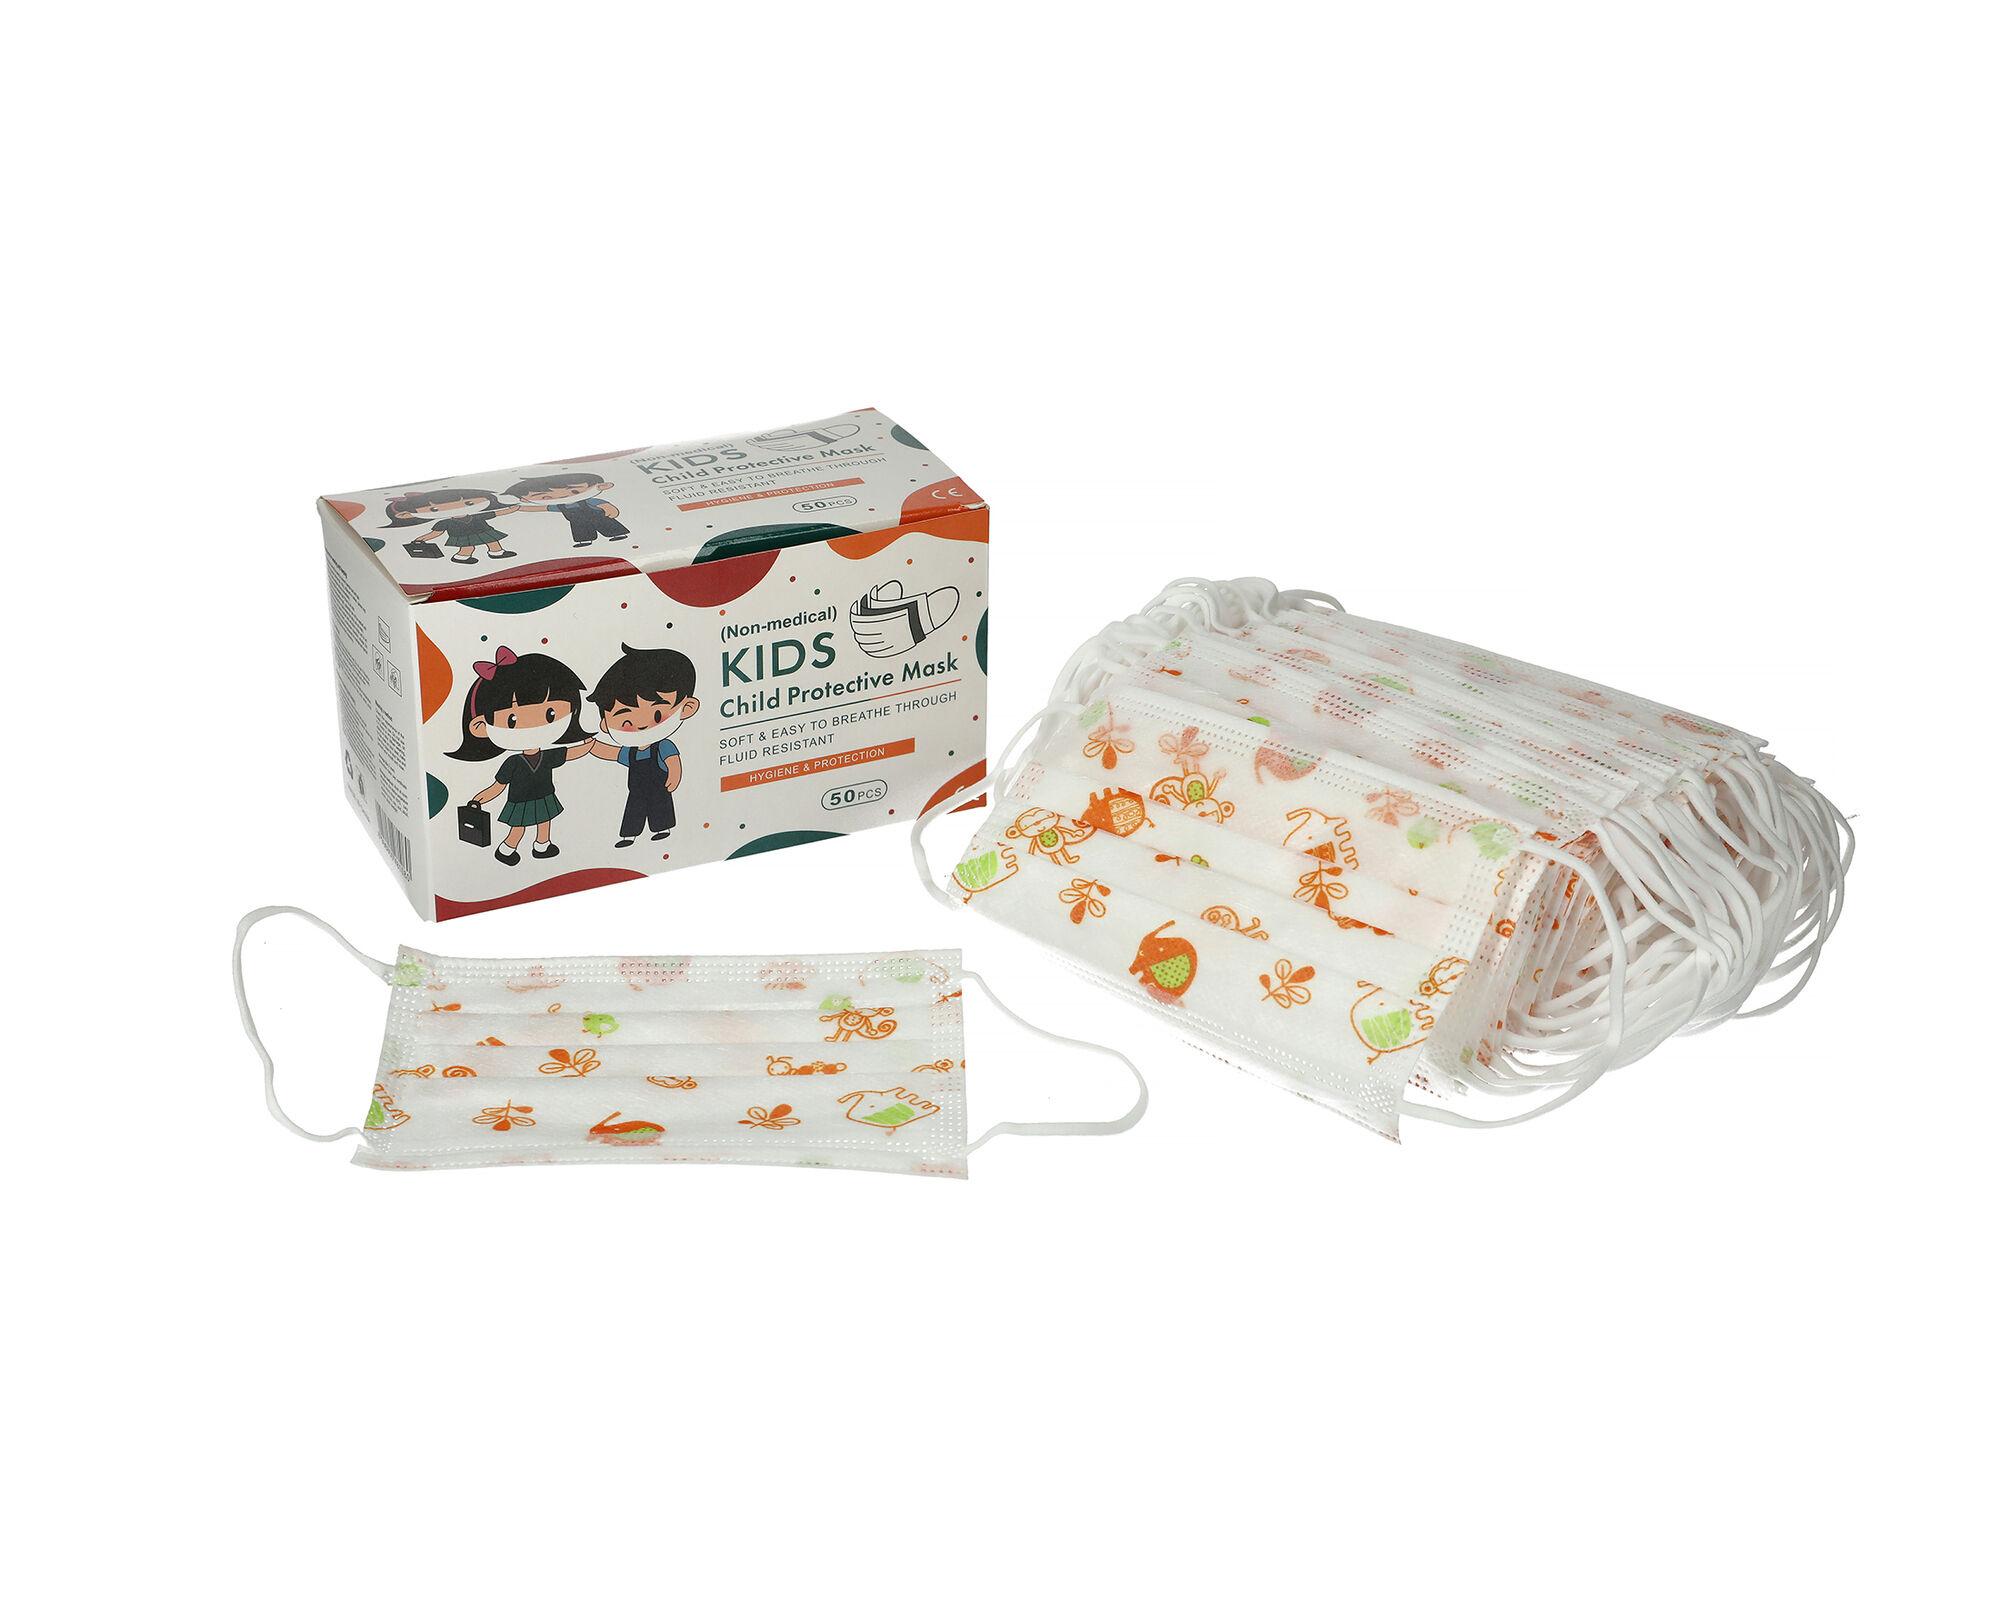 YINHONYUHE Masques enfants jetables 3 plis non médical boîte de 50 masques CE BFE > 95% - YINHONYUHE - MASQUES8